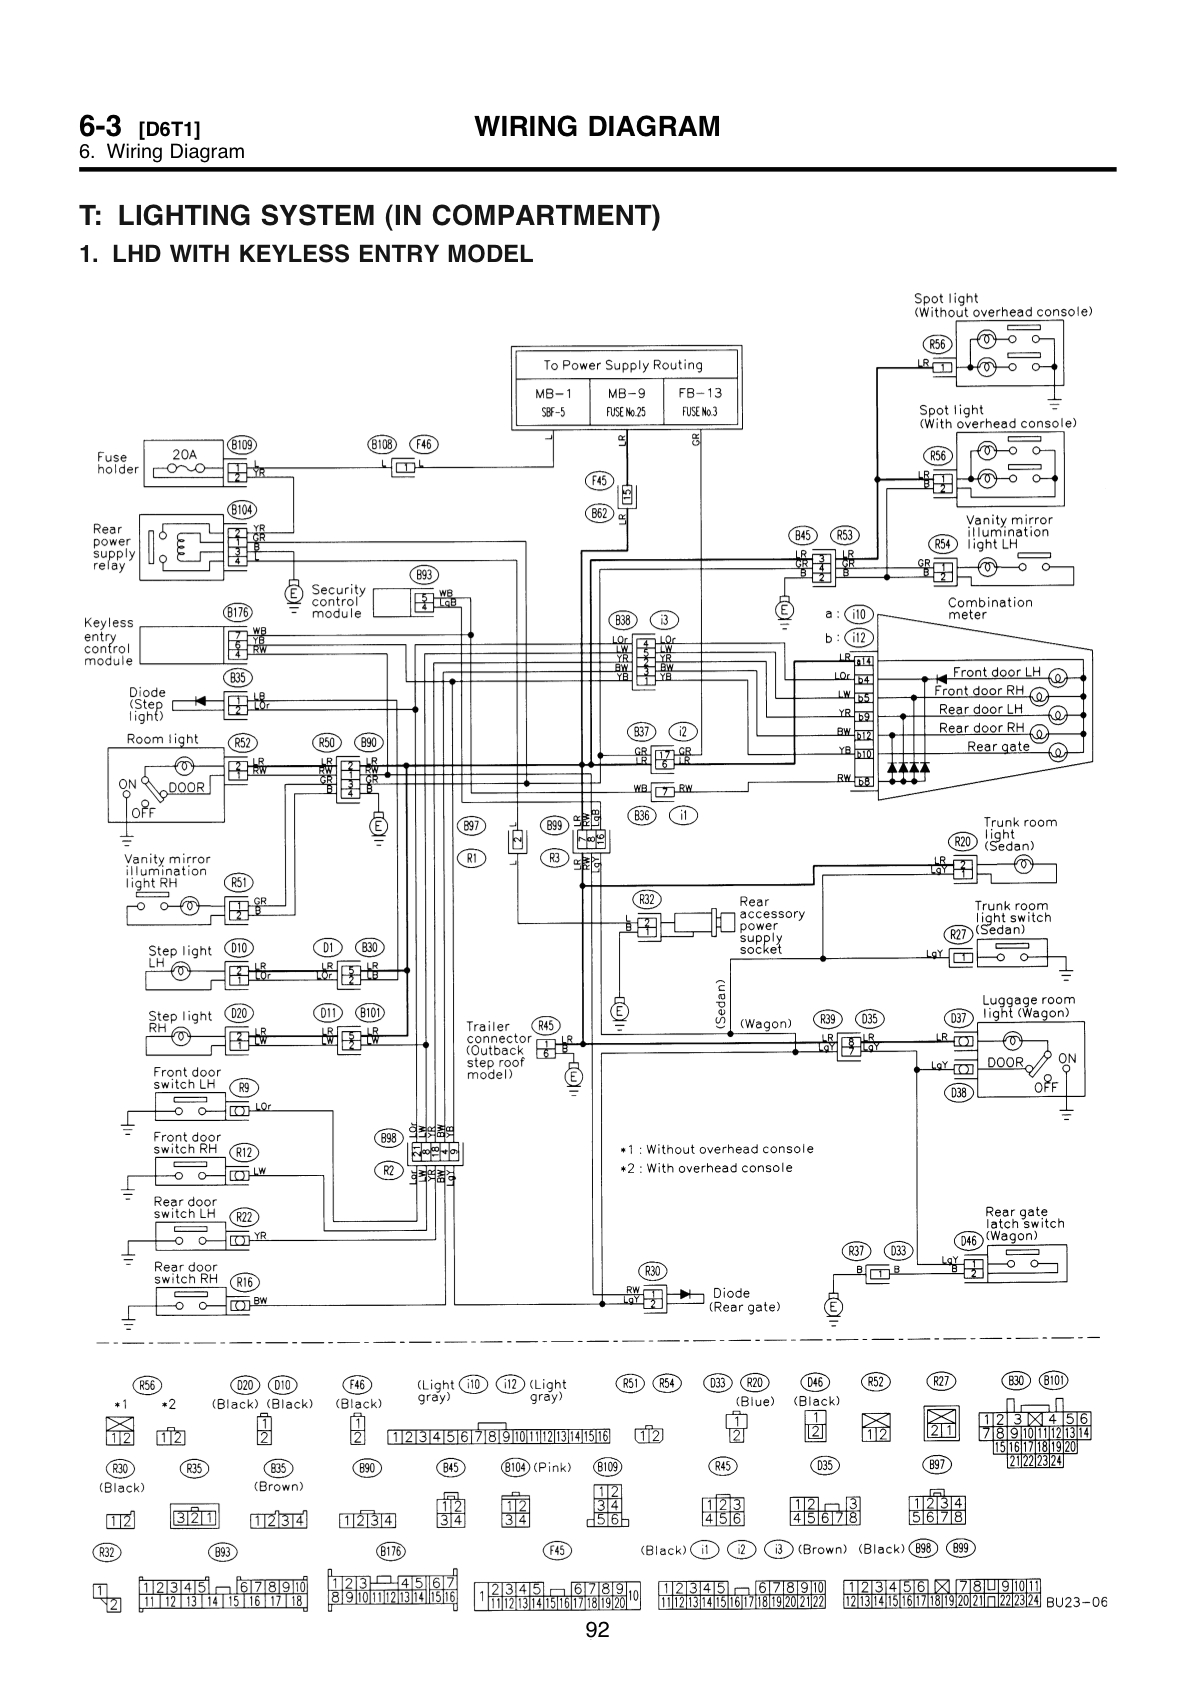 1997 subaru legacy wiring diagram 1997 subaru legacy wiring diagram beautiful wiring schmatic 98 perfect subaru stereo wiring diagram ponent 7d jpg